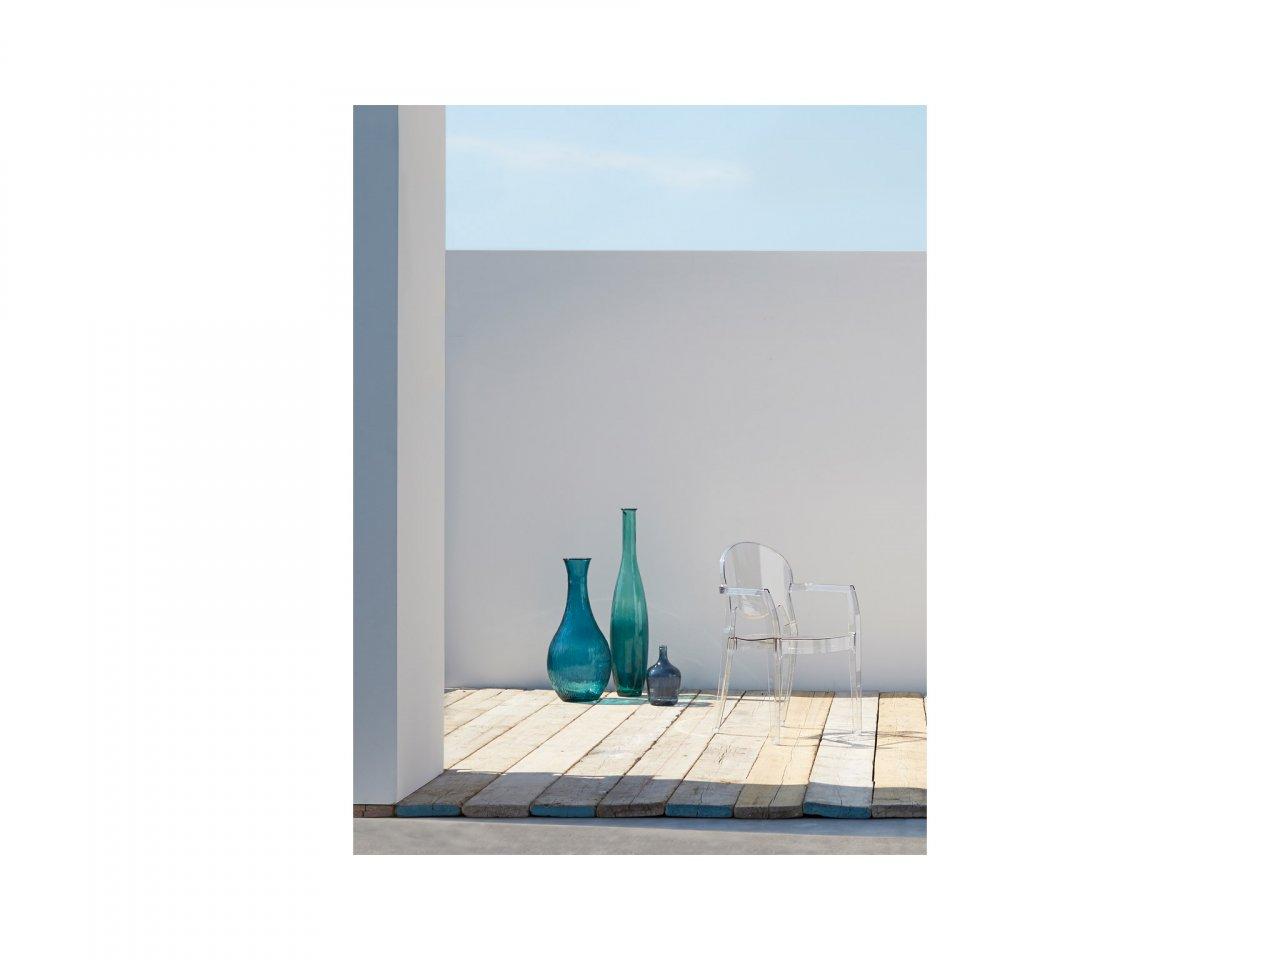 Sedia Con Braccioli Igloo - v7